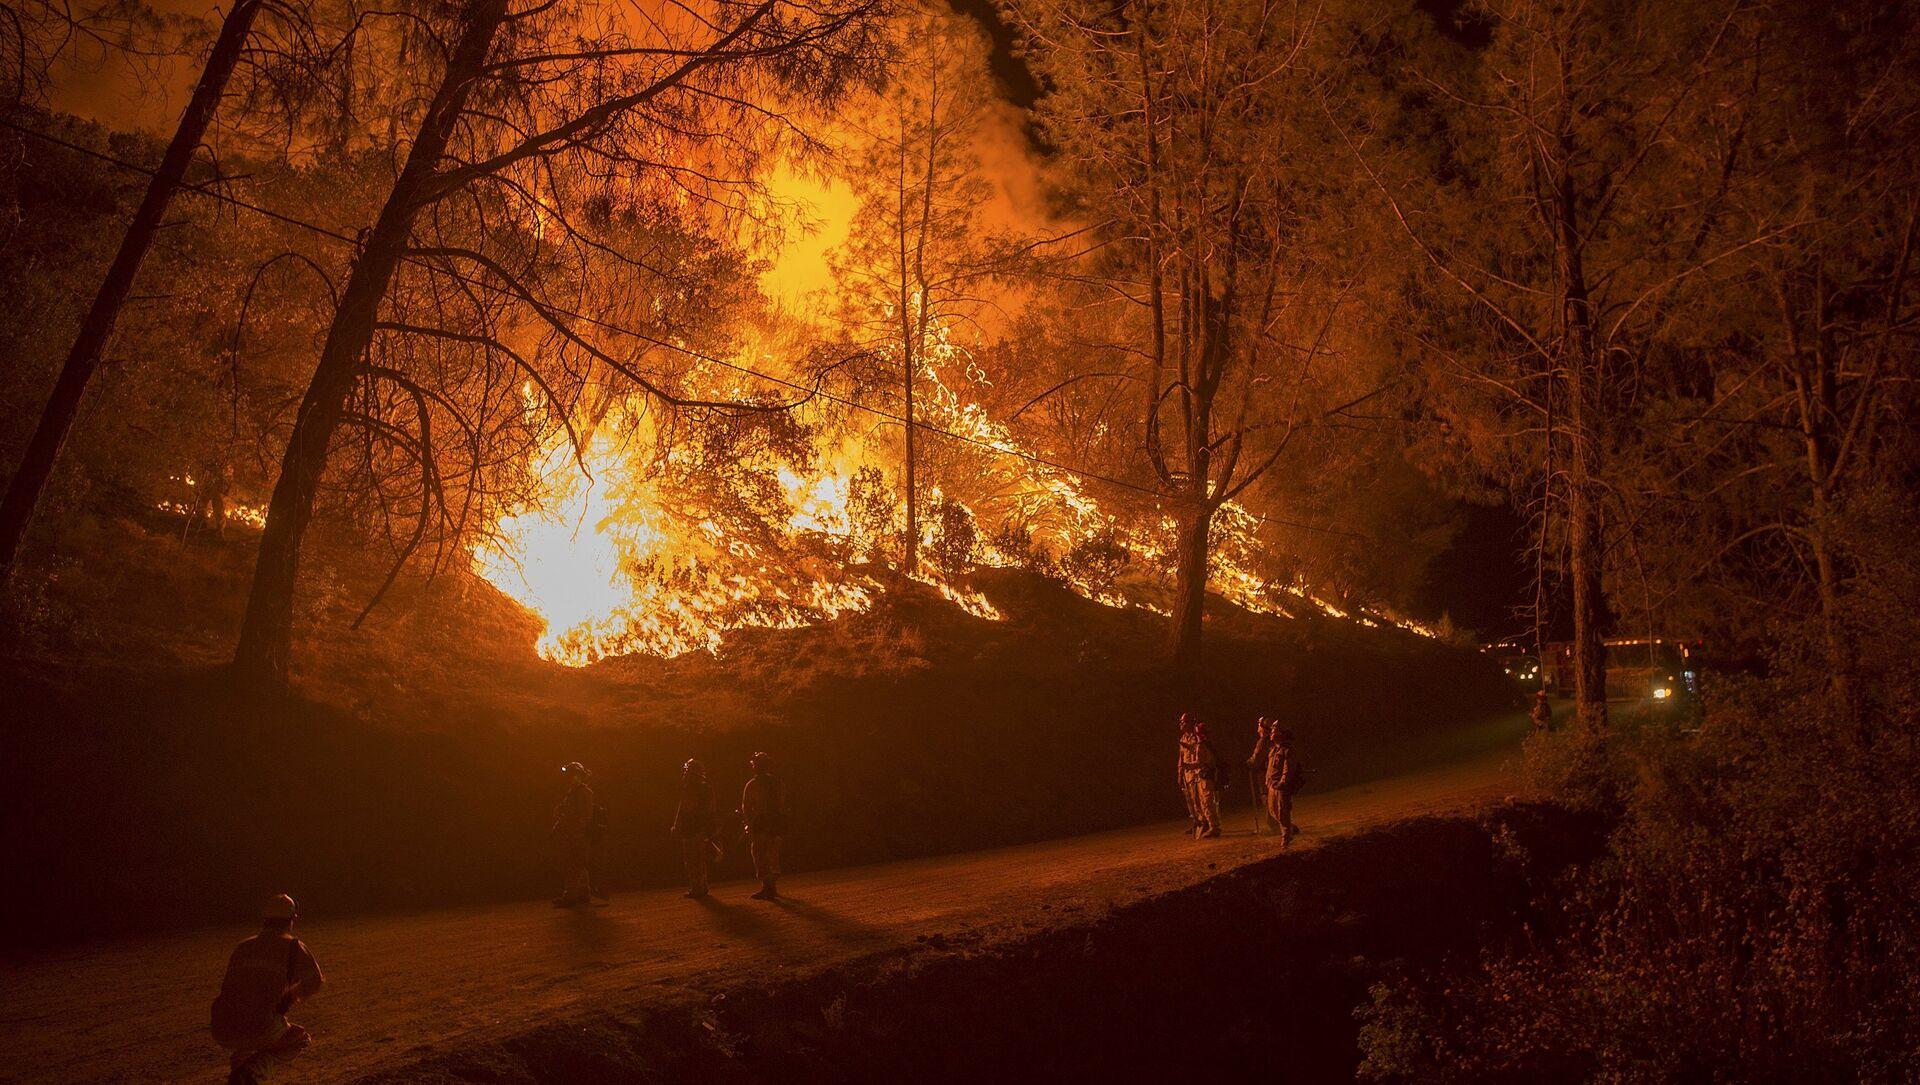 Incendies en Californie.  - Sputnik France, 1920, 12.08.2021